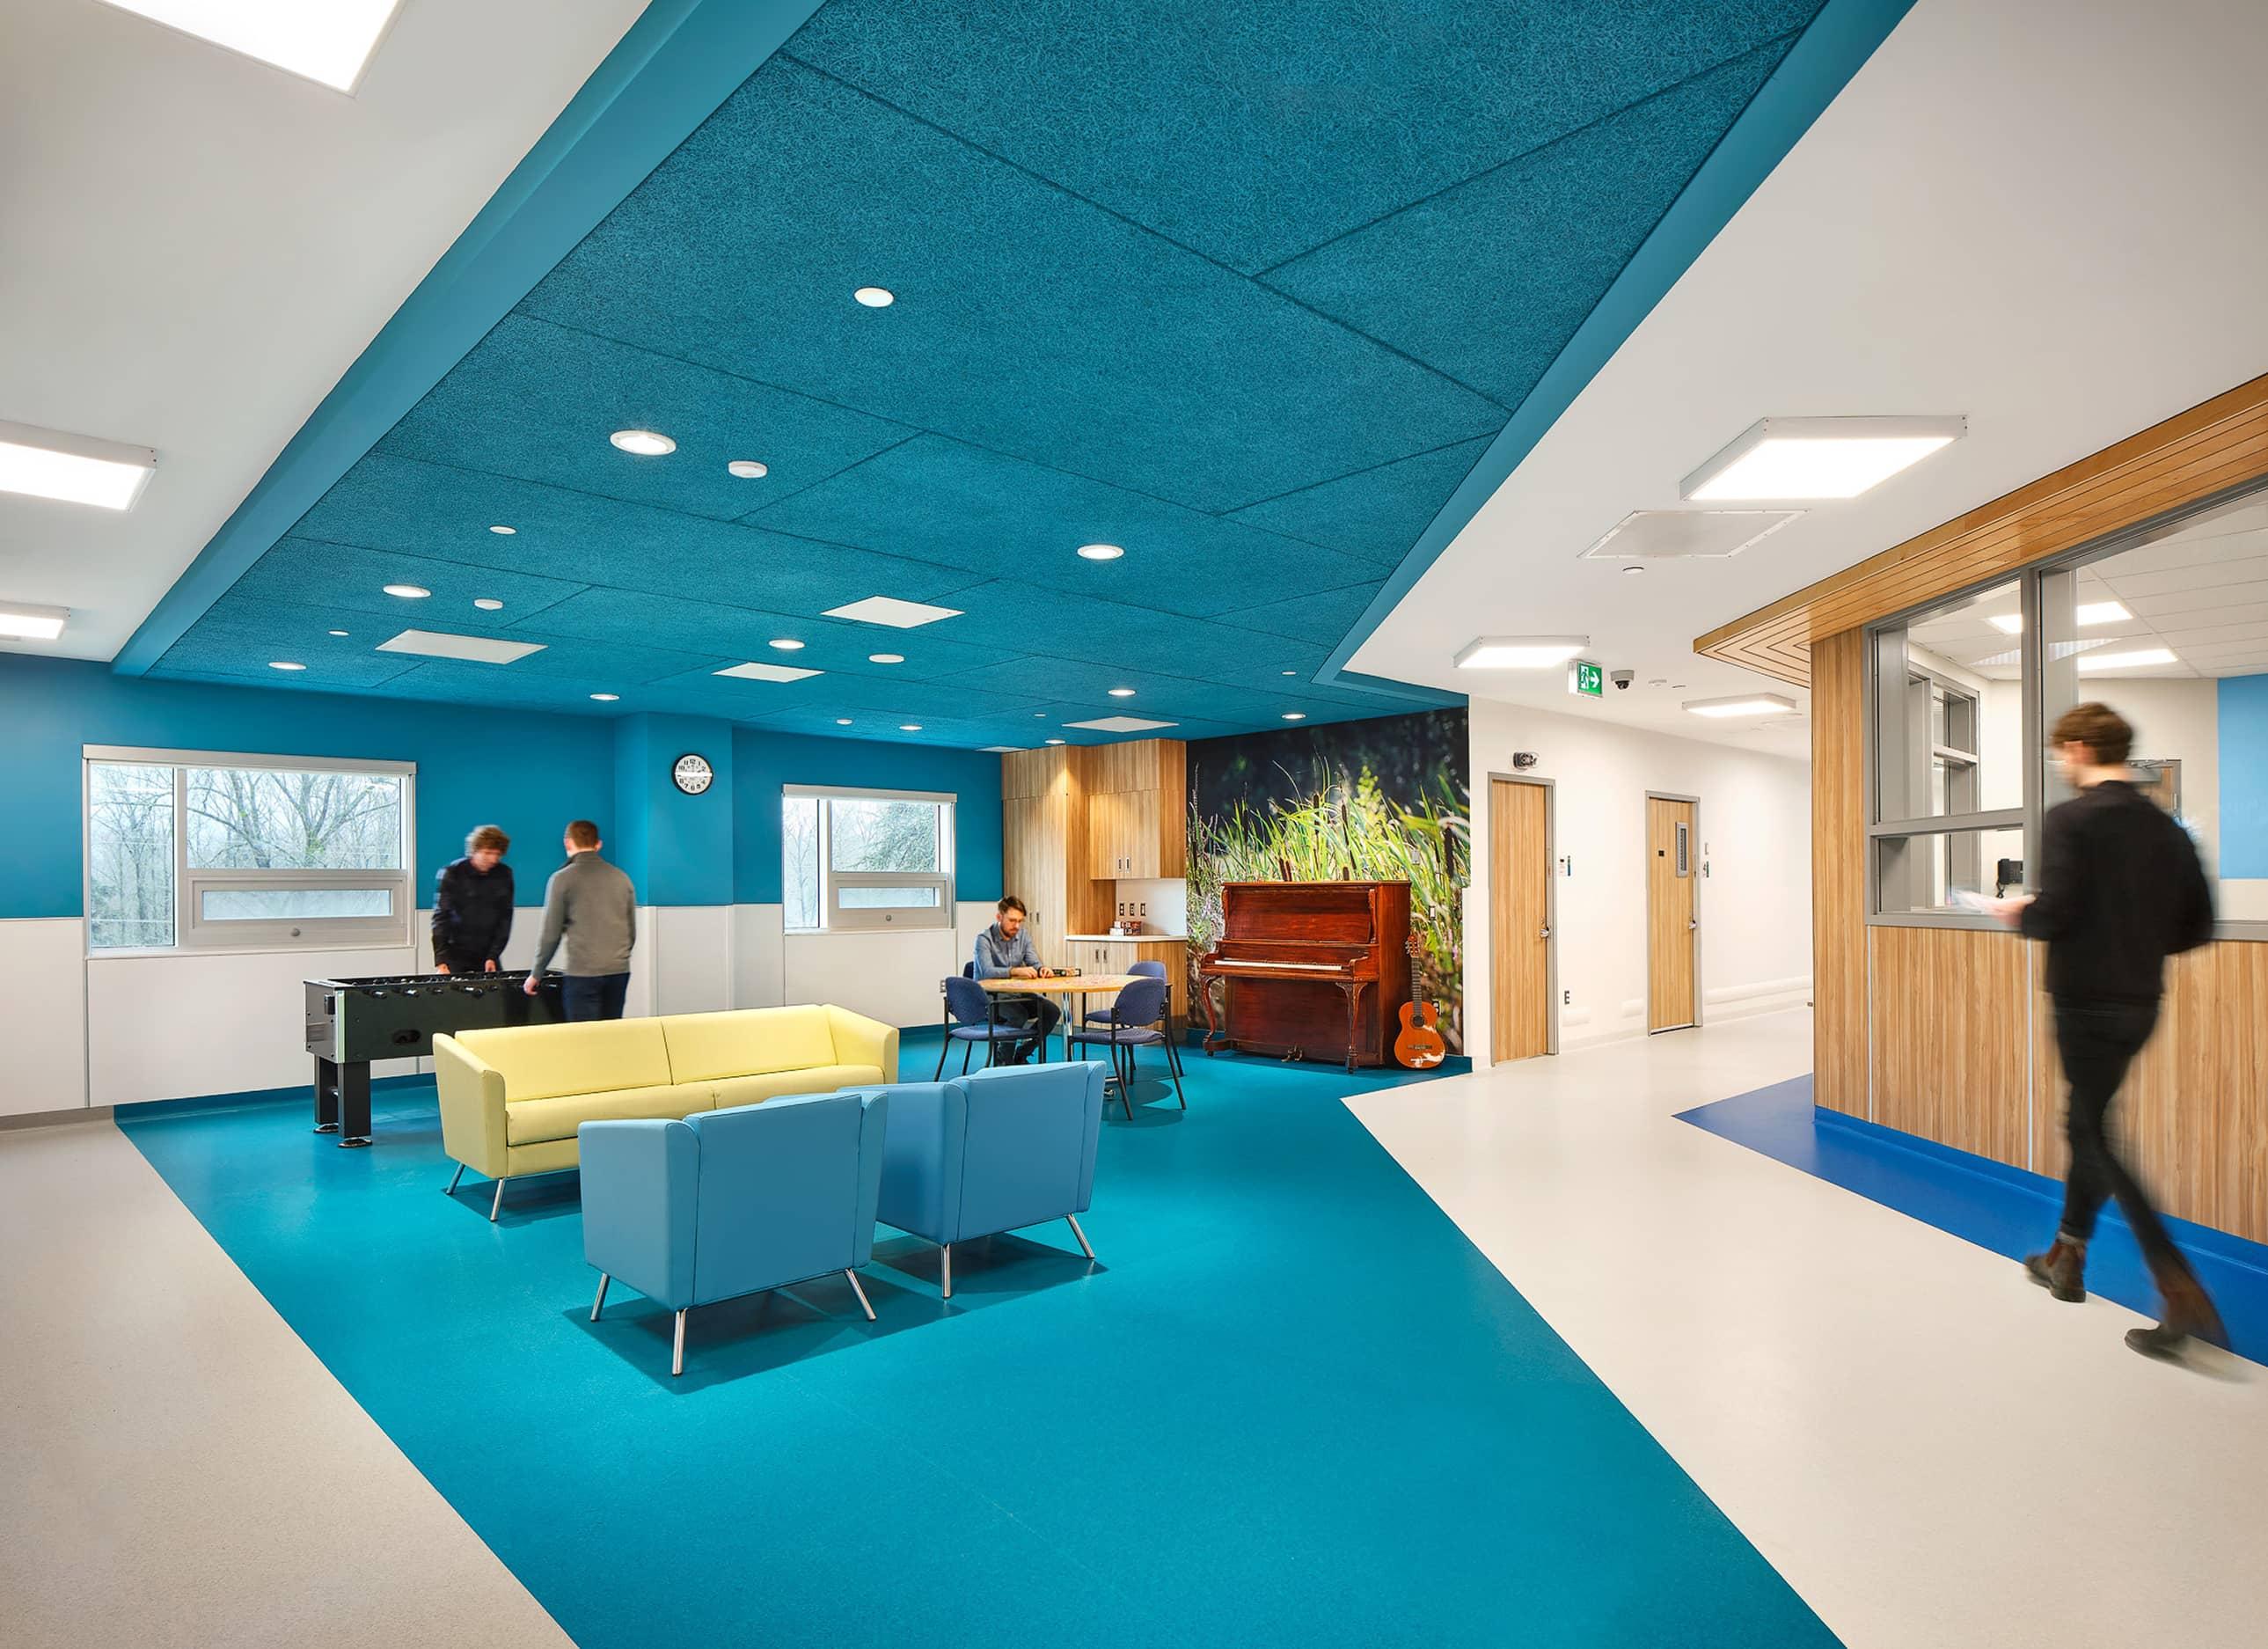 bbp healing spirit house (valleyview treatment centre) interior lobby